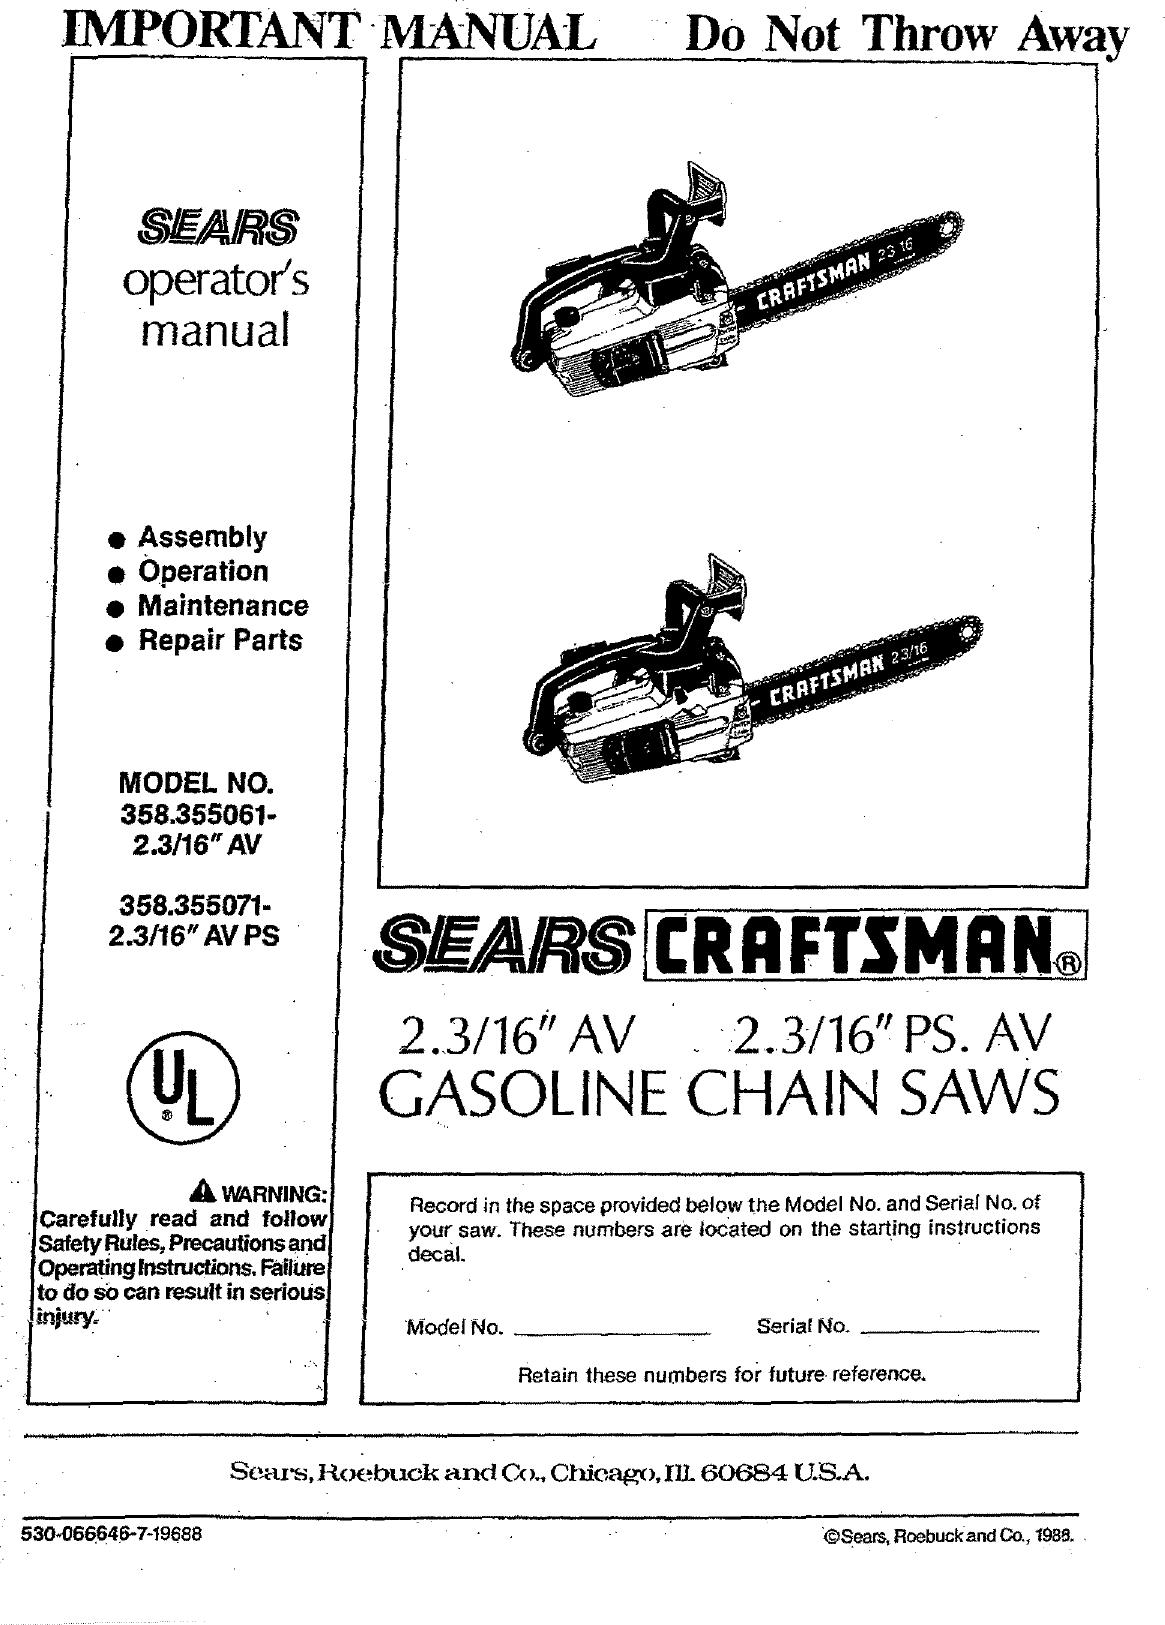 Craftsman 358355061 User Manual GASOLINE CHAIN SAWS Manuals